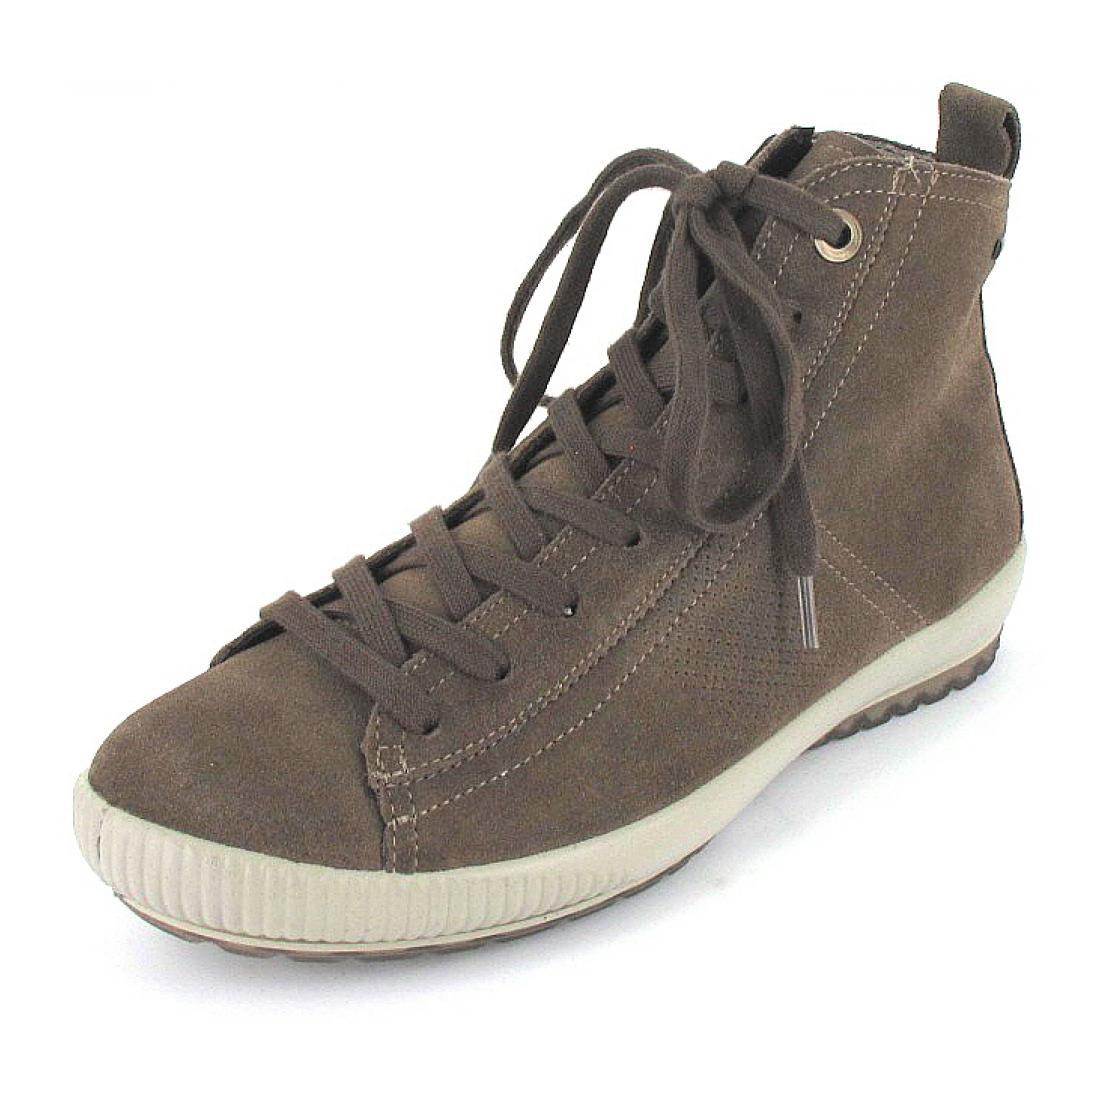 Legero Sneaker high Tanaro 4.0